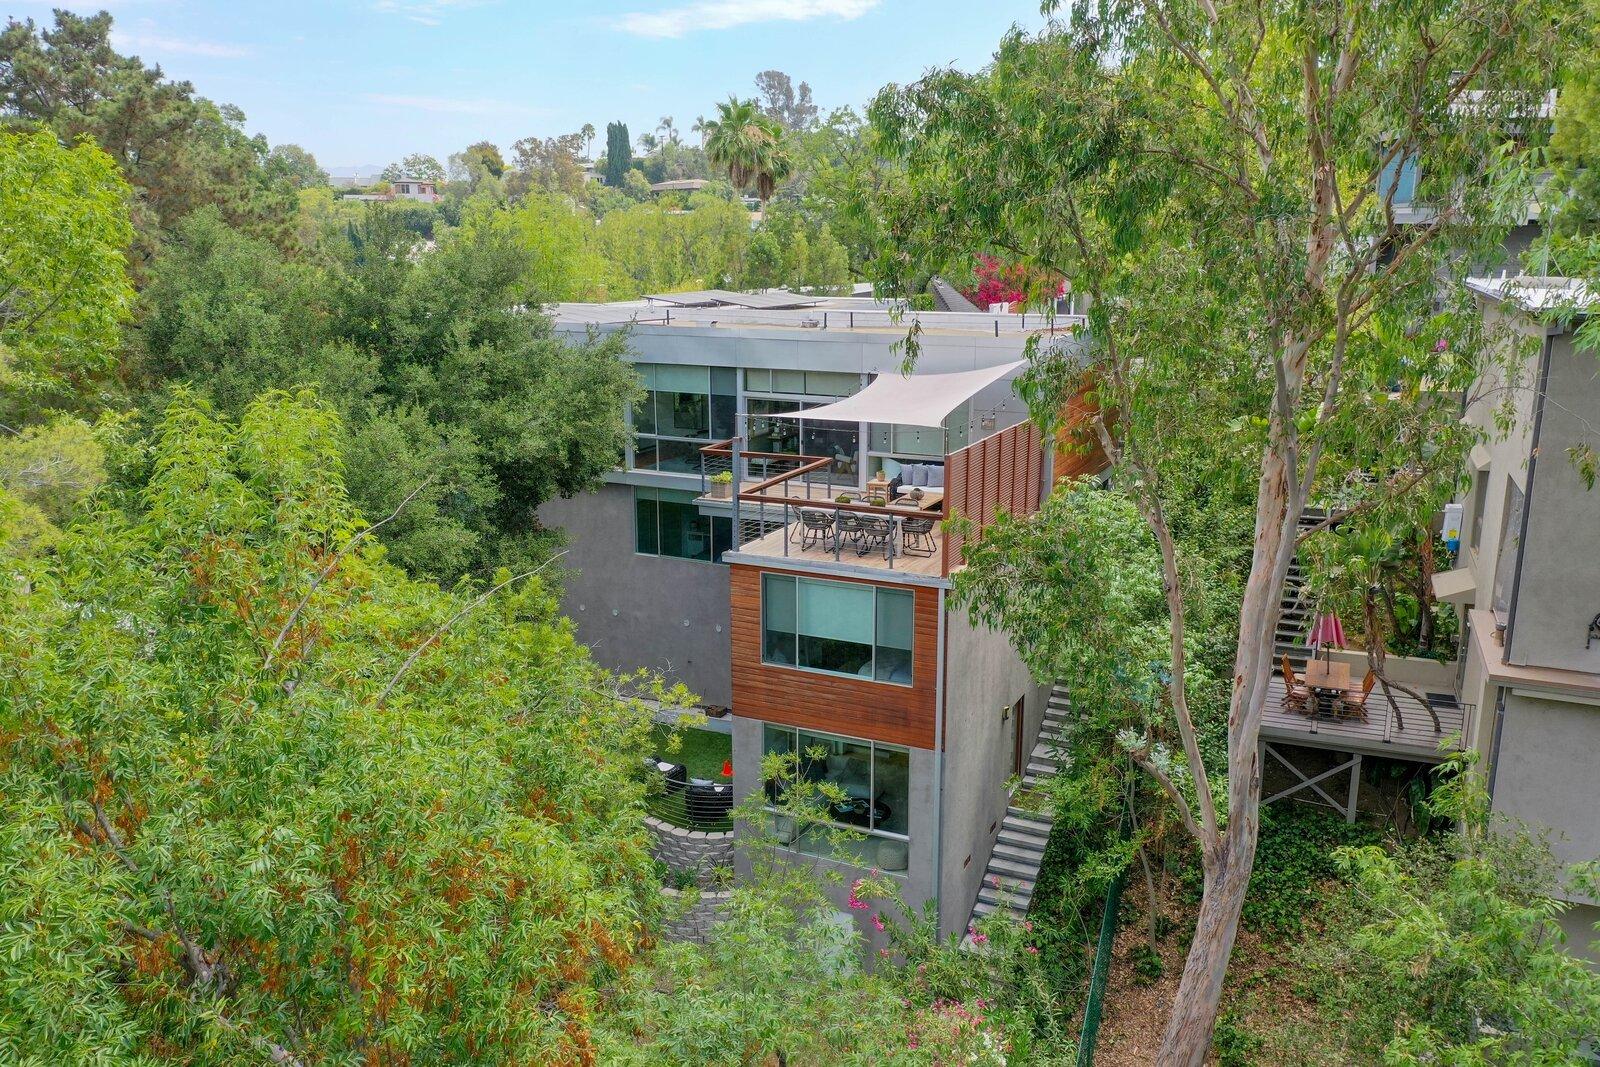 A Tree House–Inspired Kit Home by Prefab Pioneer Rocio Romero Seeks $2.3M in L.A.